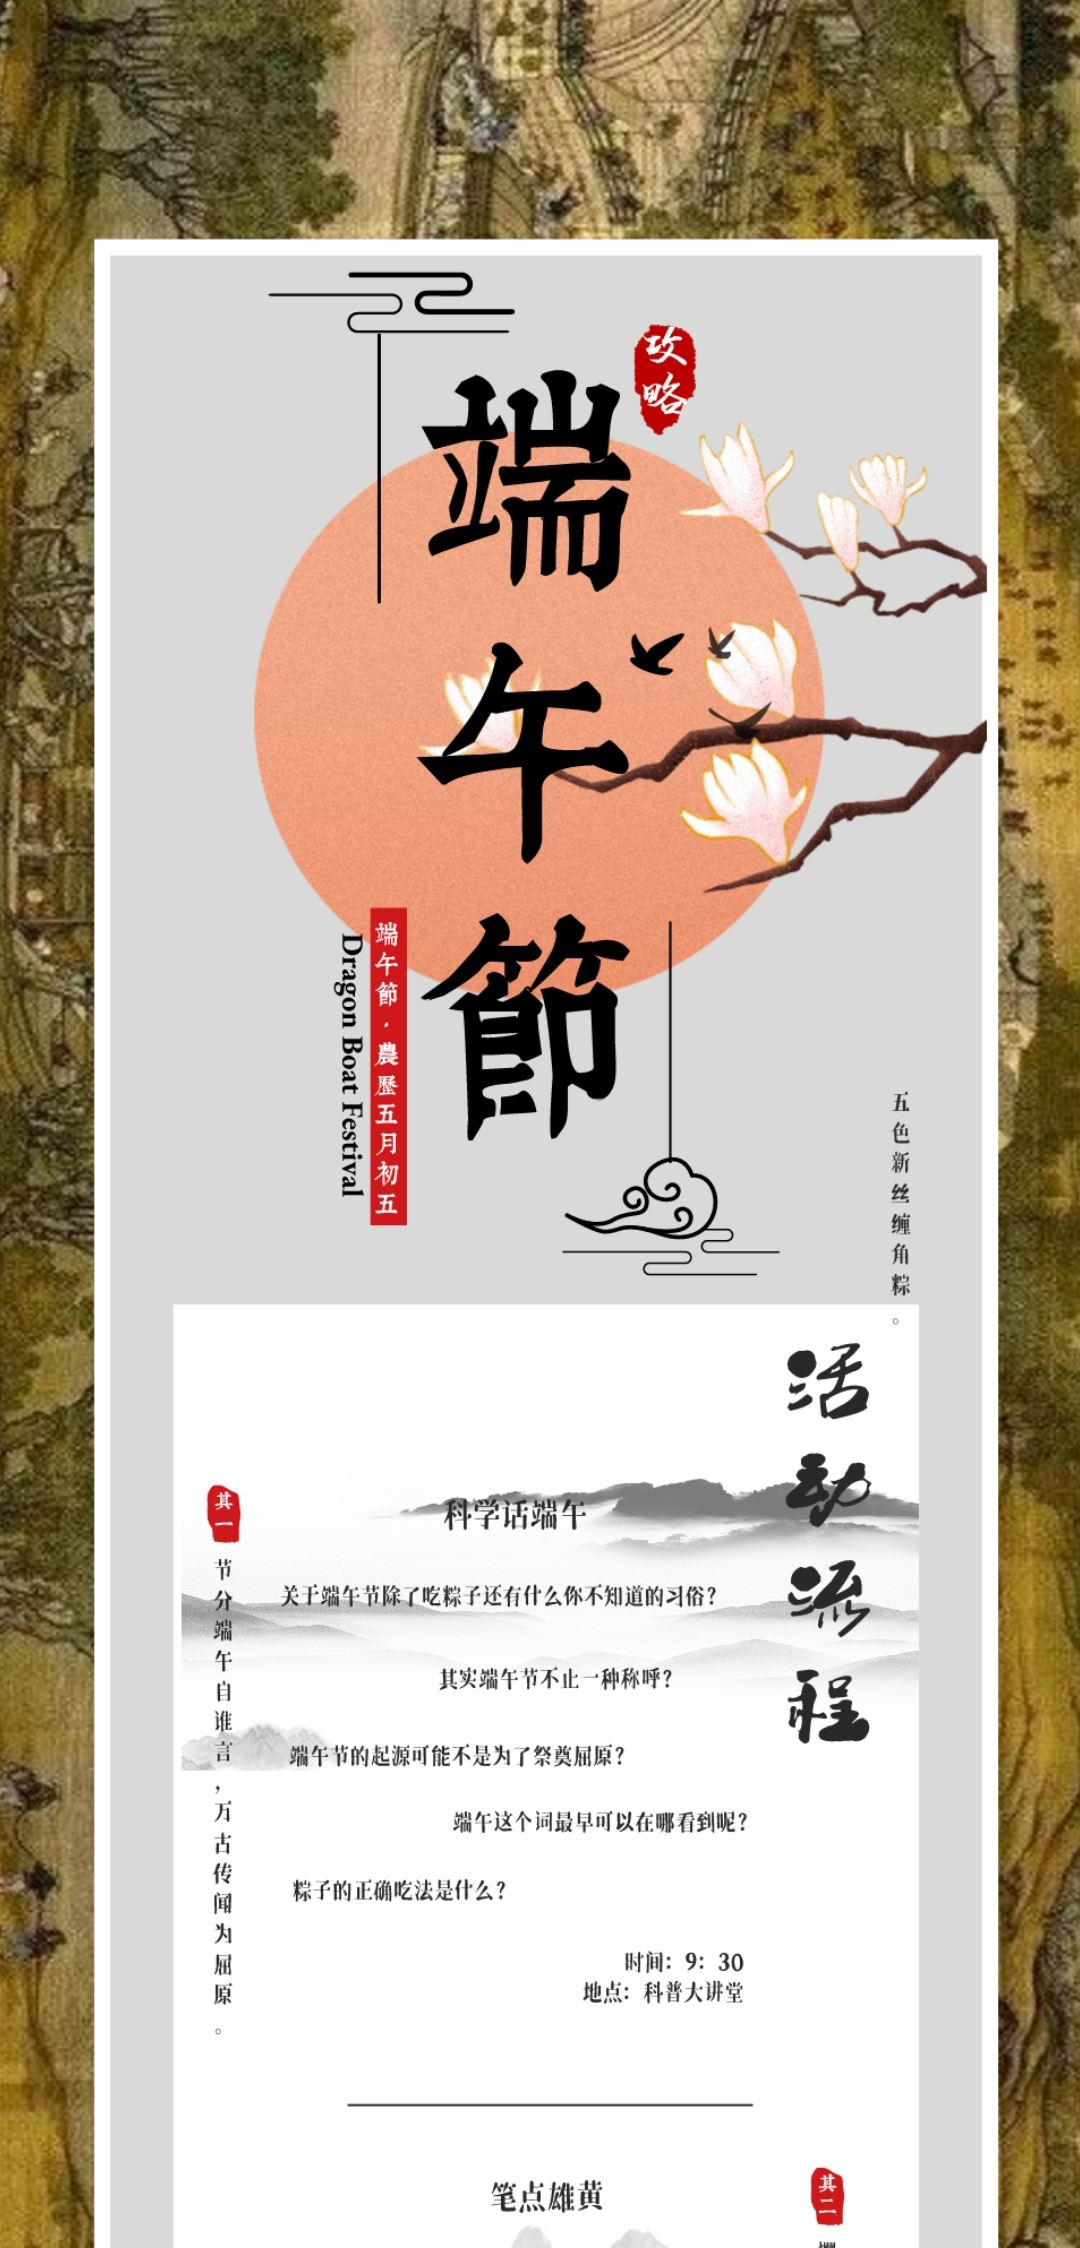 http://www.huodongxing.com/file/20210604/7594172474266/784175120132220.jpg